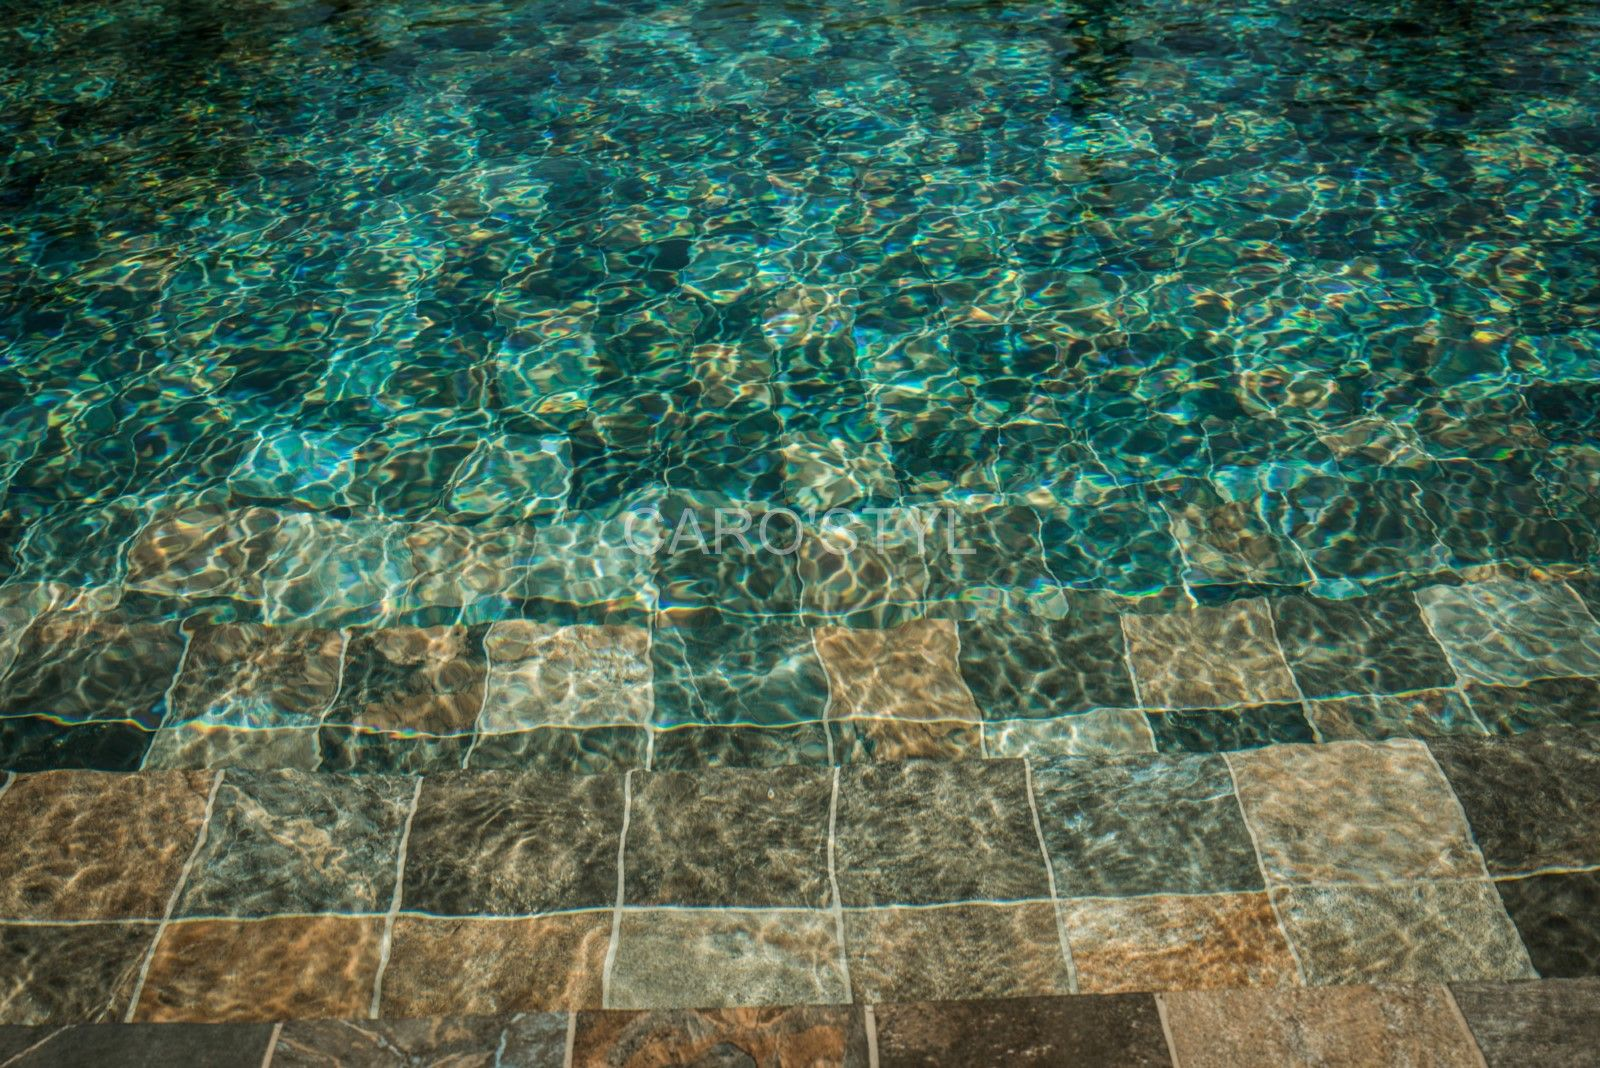 Carrelage Green Bali 15x15 Ingelif Et Facile D Entretien Carrelage Piscine Piscine Construire Une Piscine